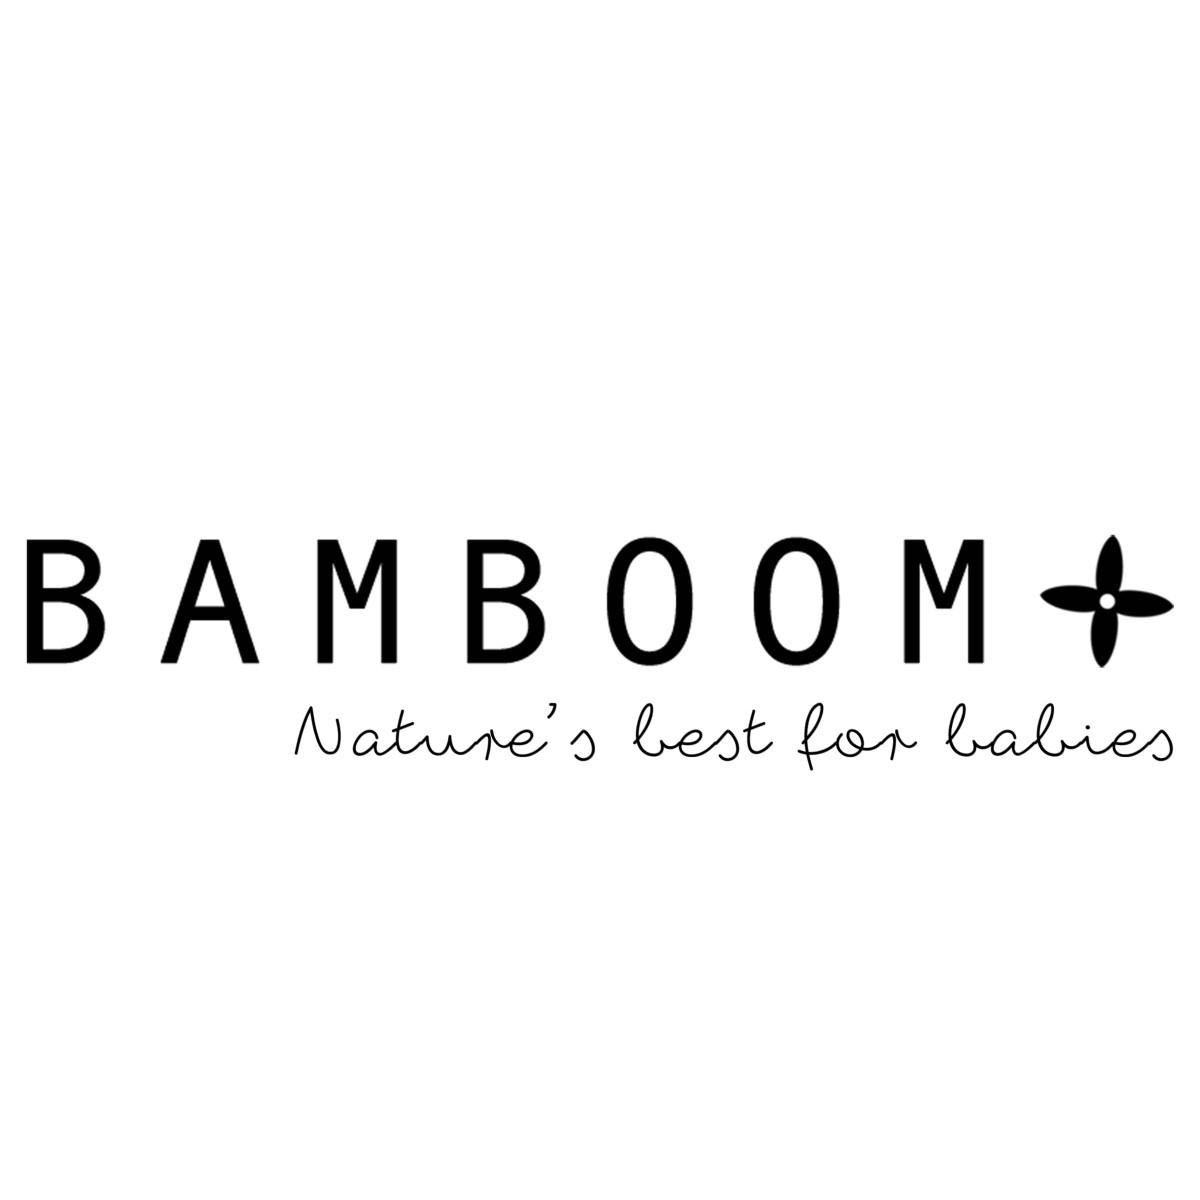 Bamboom